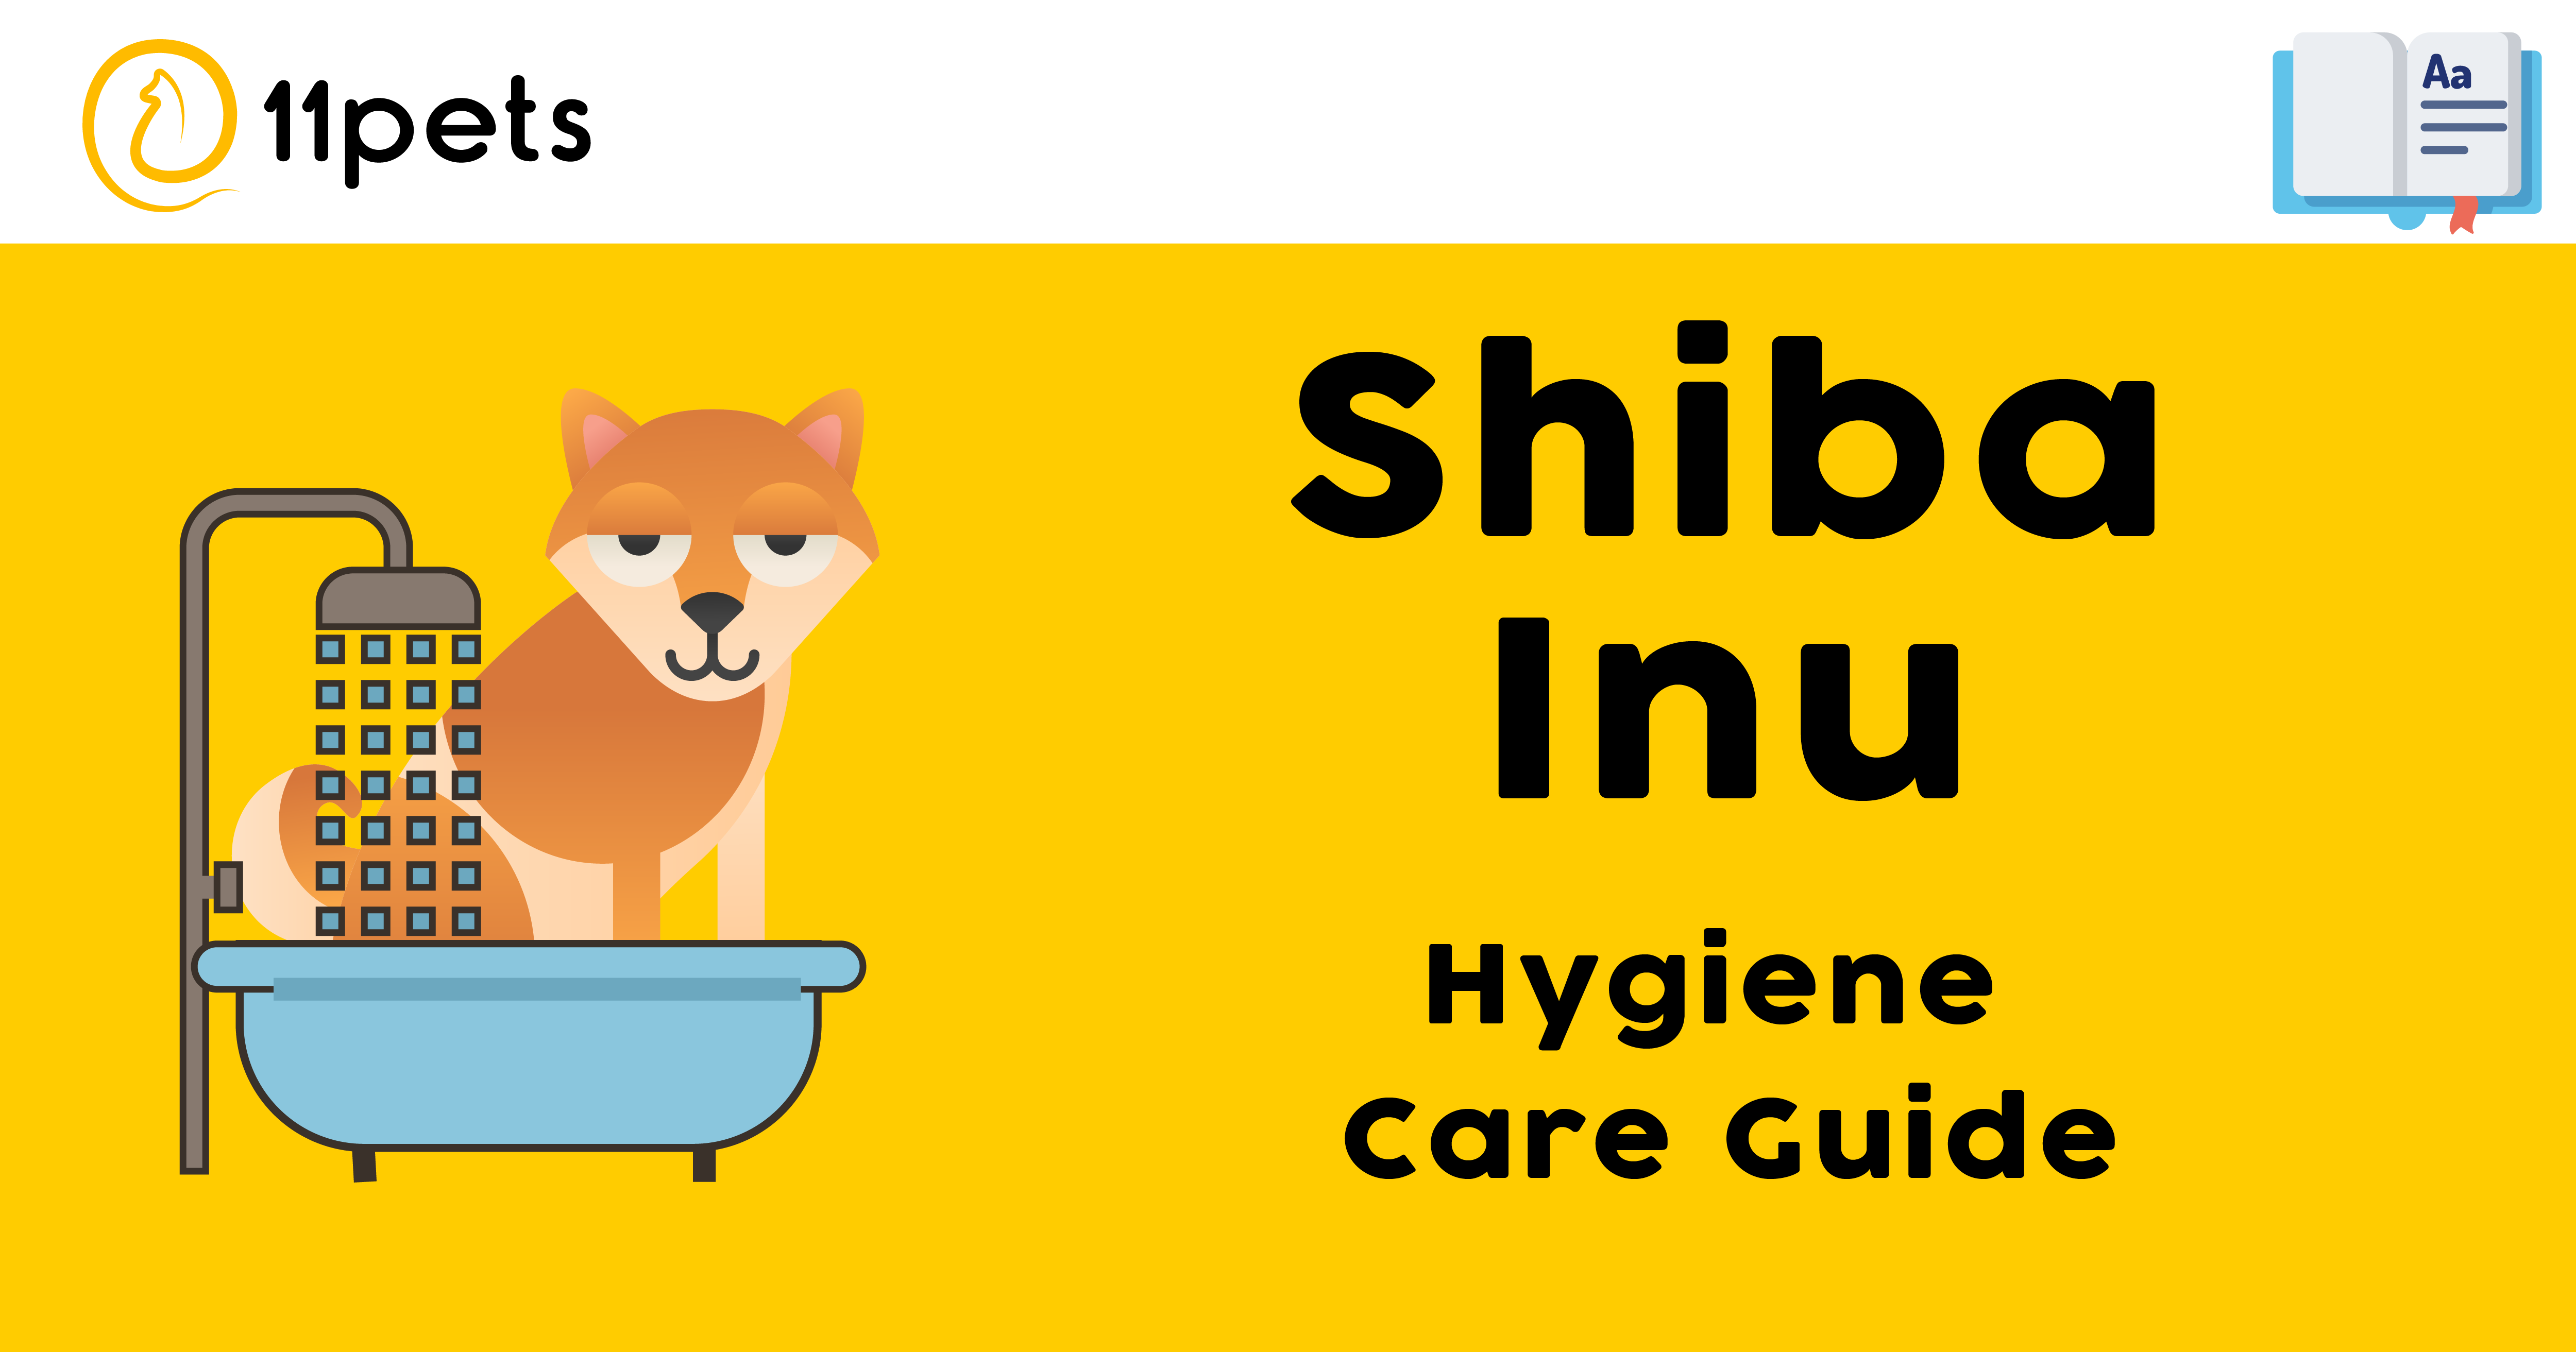 Hygiene Care Guide for Shiba Inu